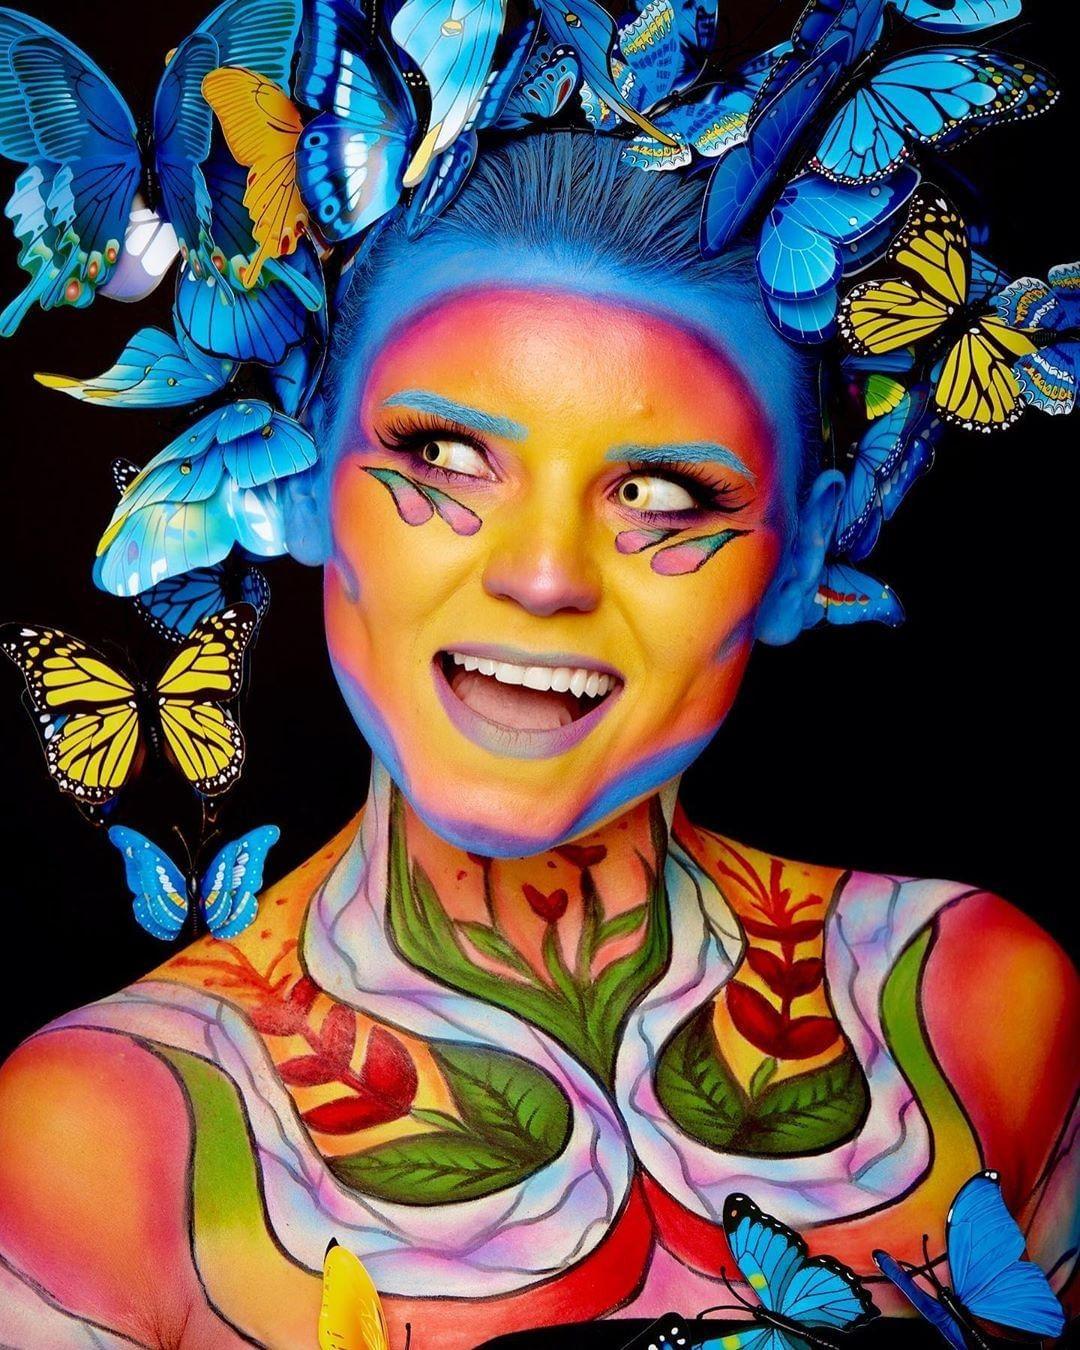 Nyx Professional Makeup On Instagram Blown Away By Faceawards Winner Ioana114 Magical Wonderlandafterdark Look She Uses Our Modern Dreamer Shadow Palett